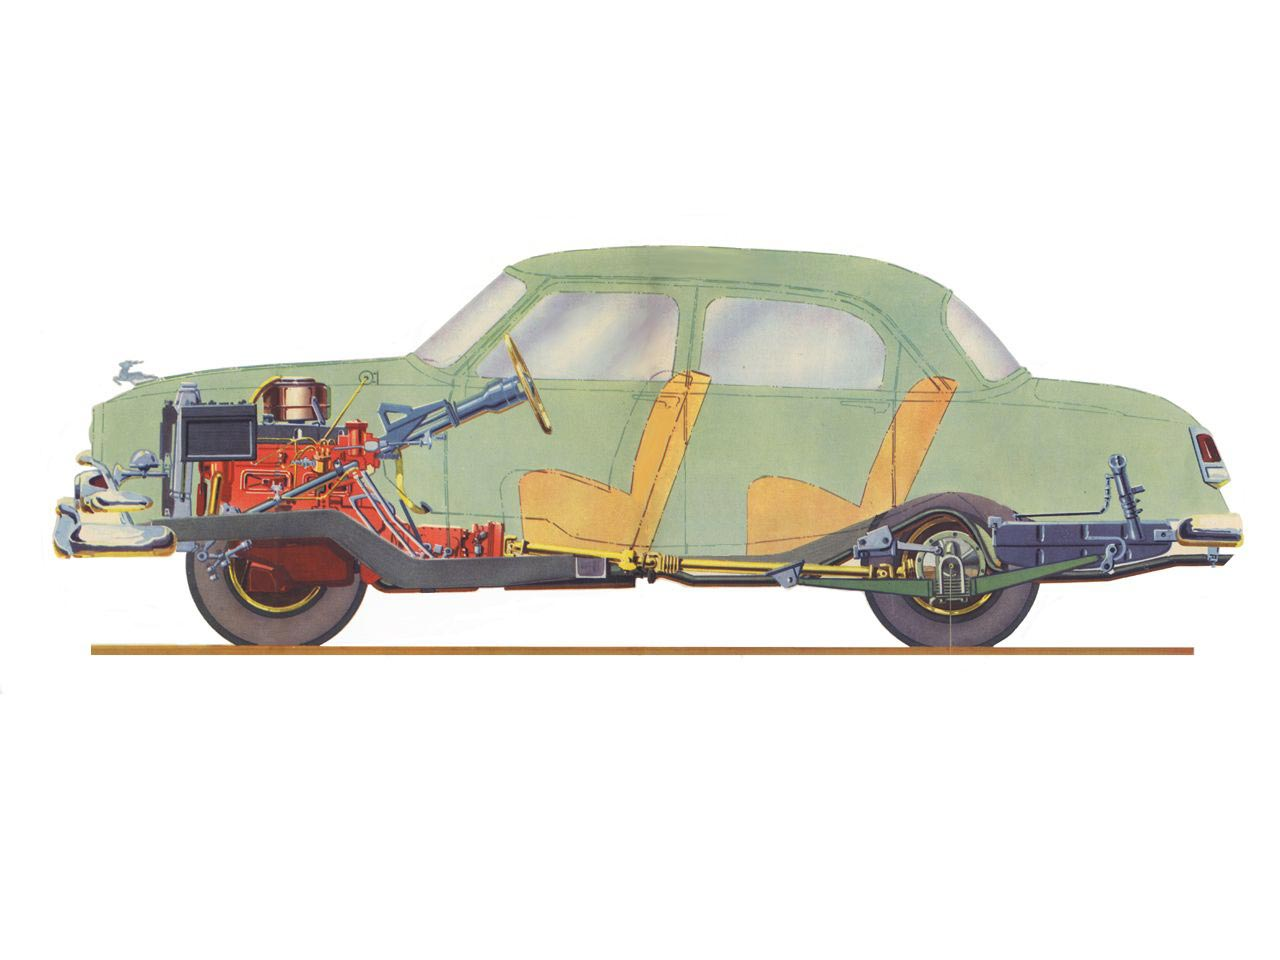 GAZ-21 Volga cutaway drawing